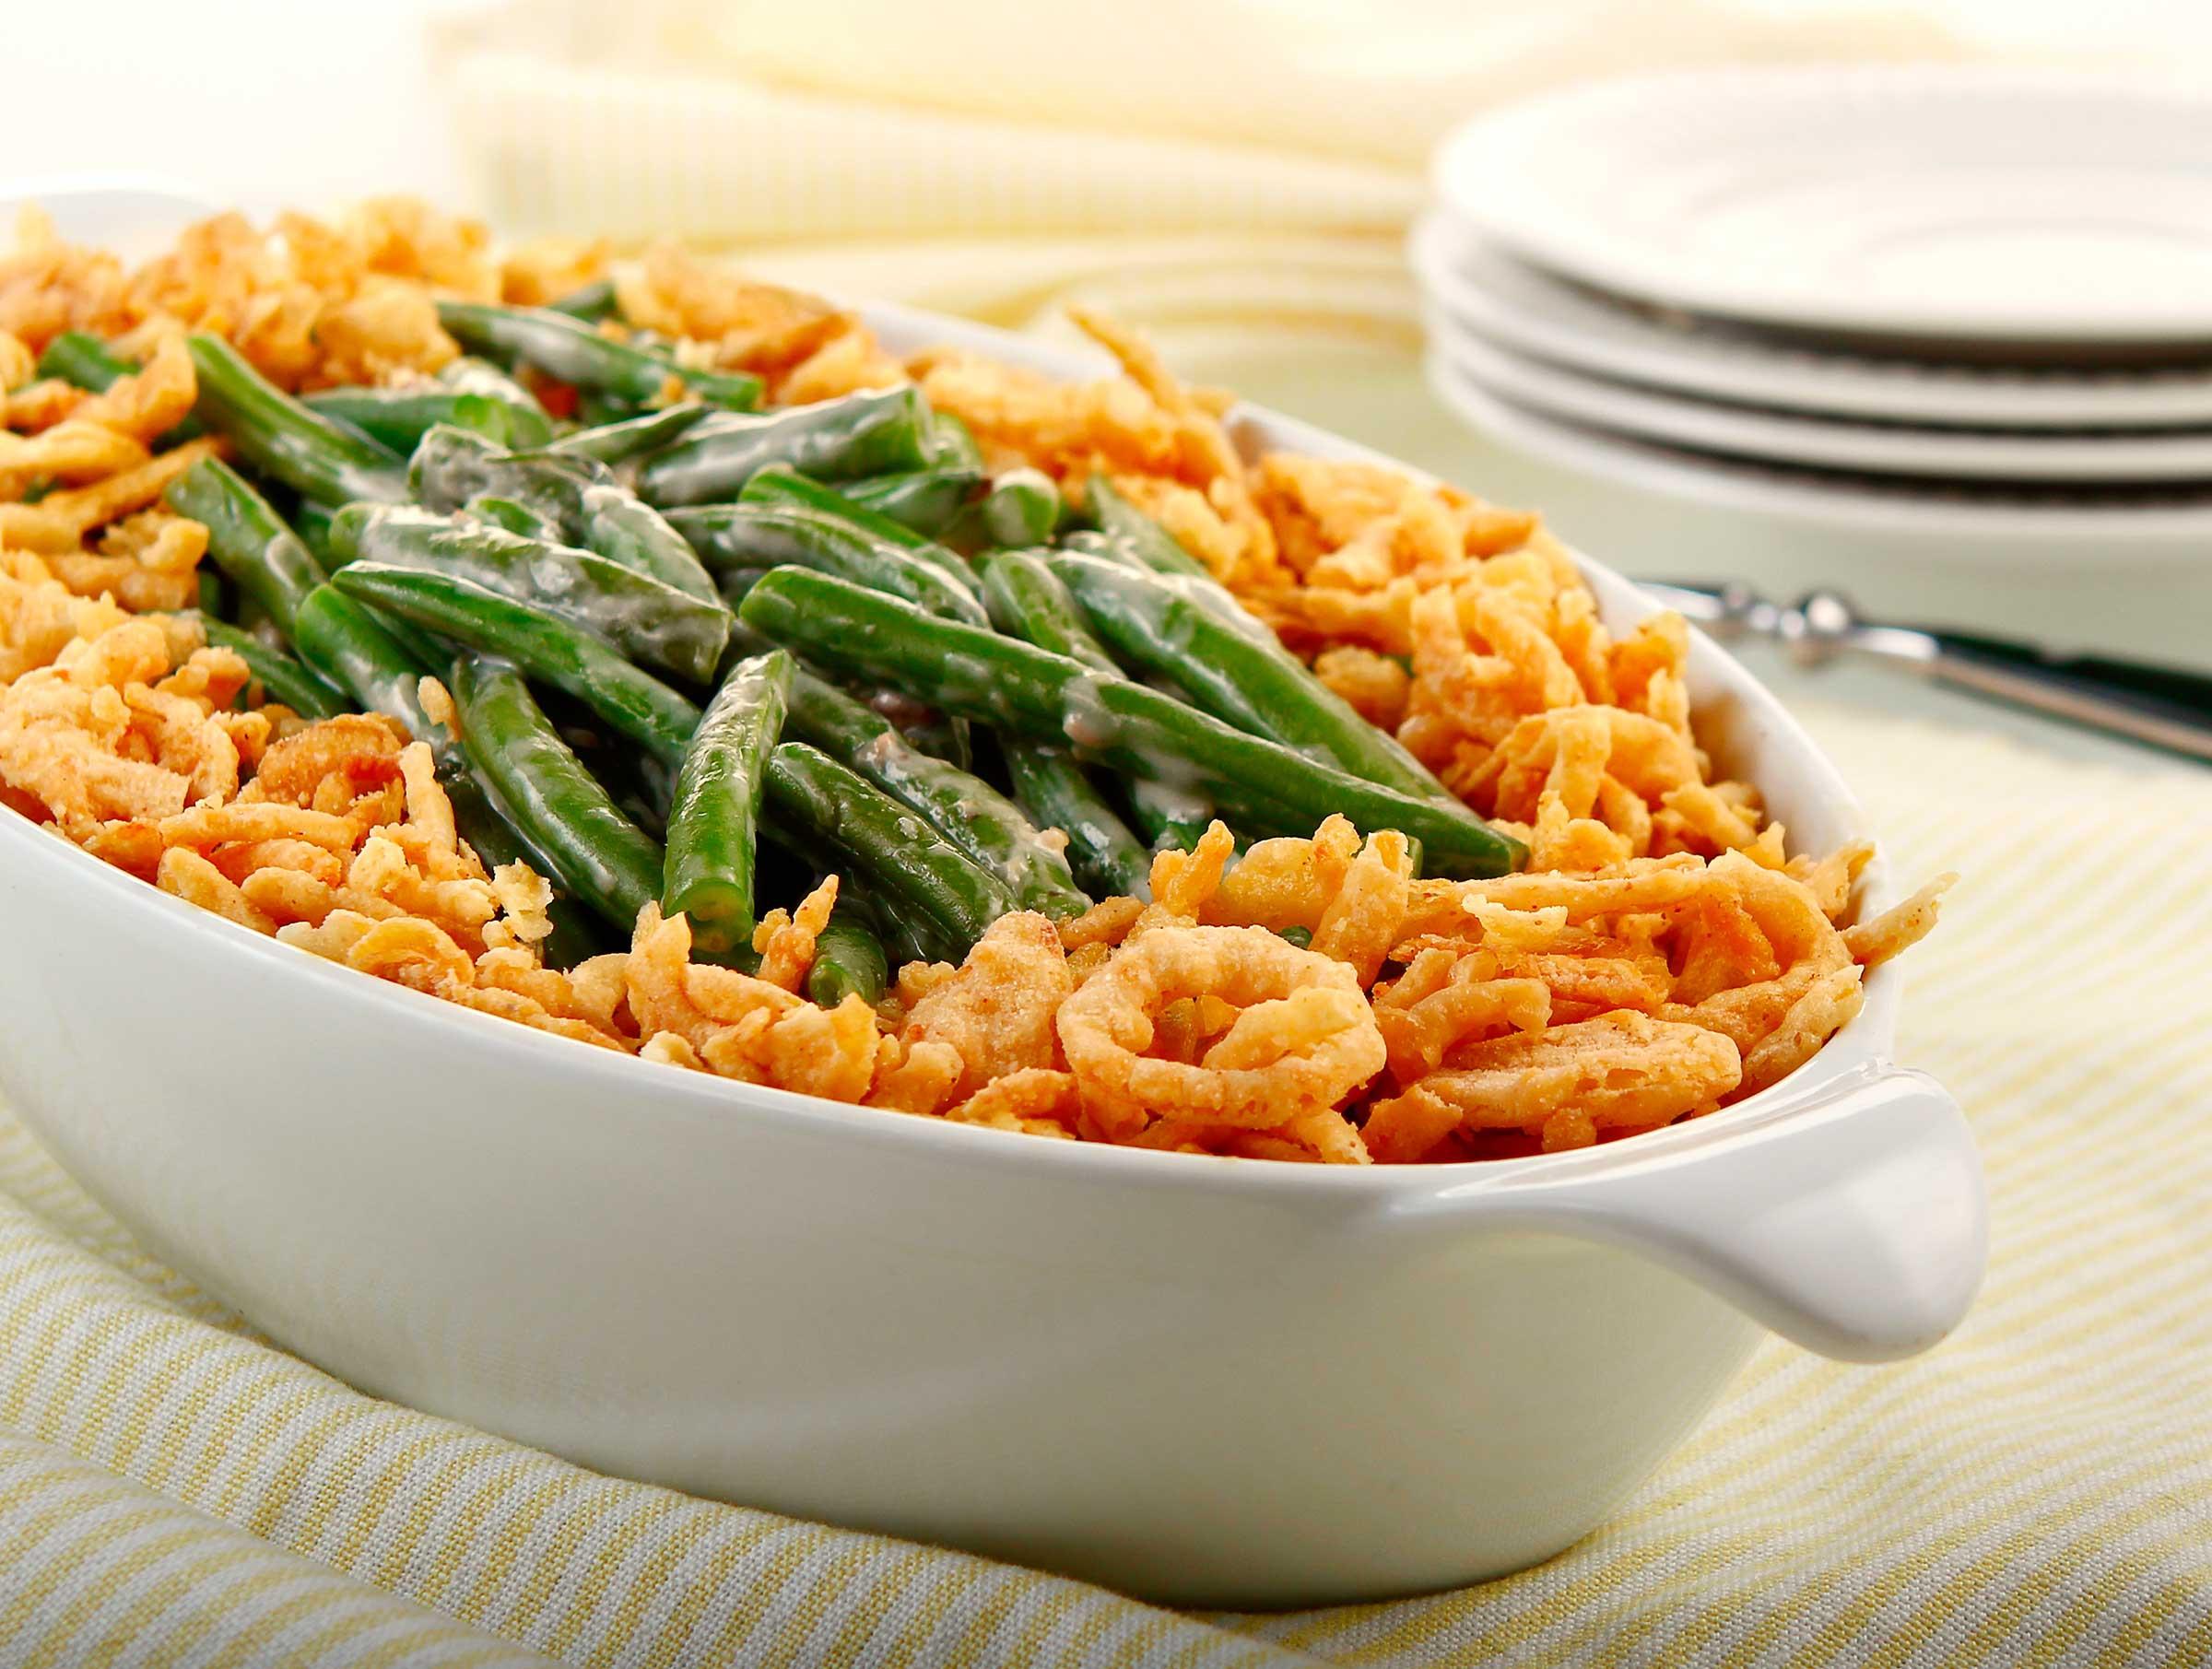 Green Bean Casserole Thanksgiving  Best and Worst Thanksgiving Foods for Weight